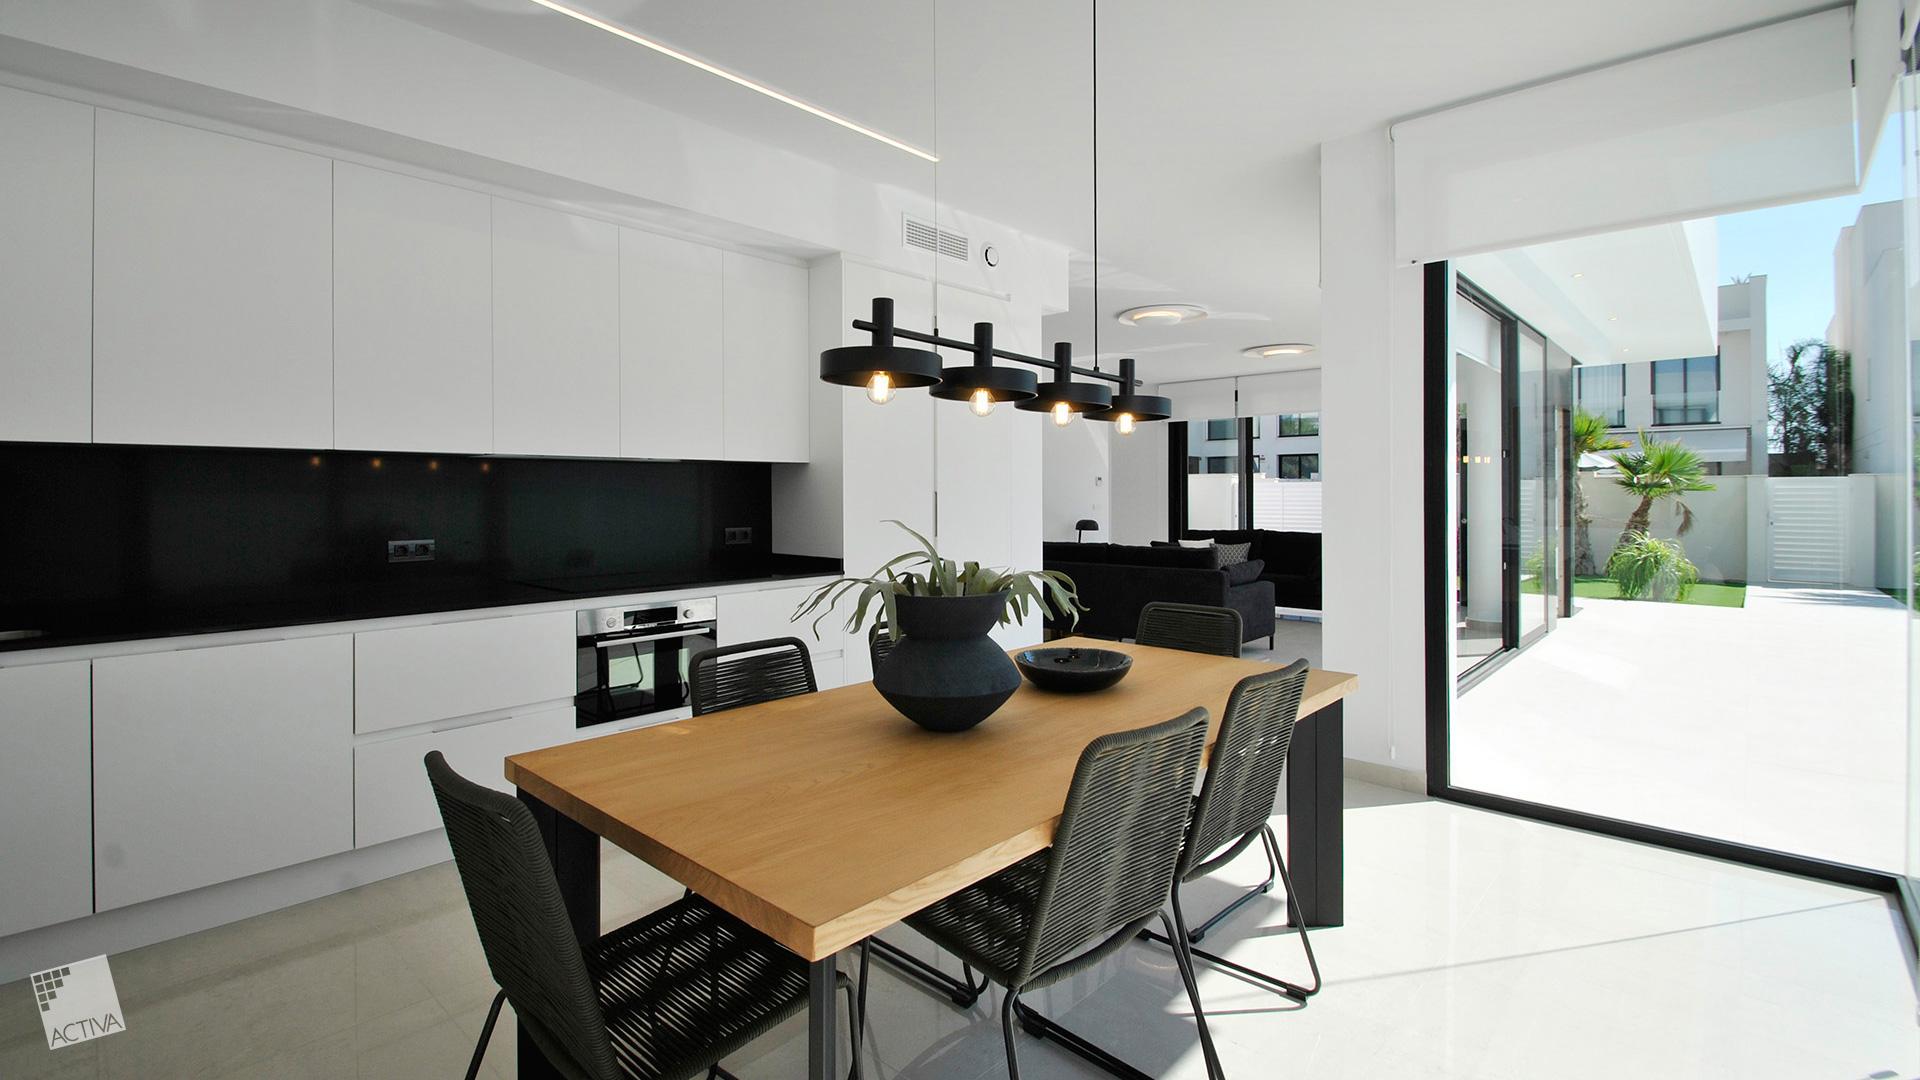 Image Sensational Design Villa in Quesada 4